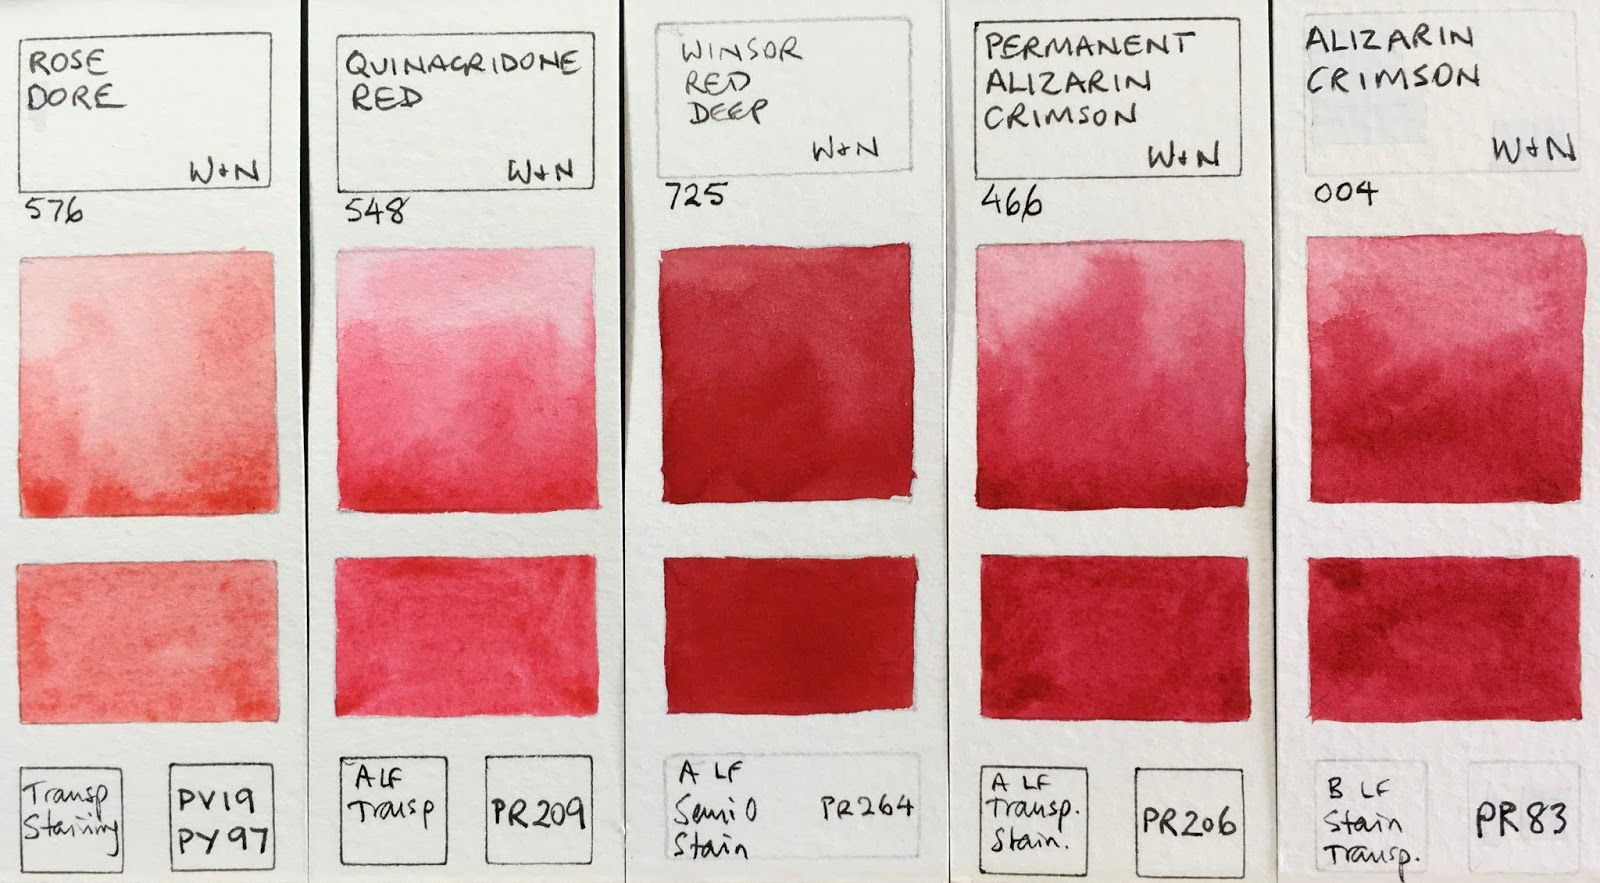 Winsor  newton watercolours rose dore quinacridone red deep permanent alizarin crimson also jane blundell artist full range rh janeblundellartspot